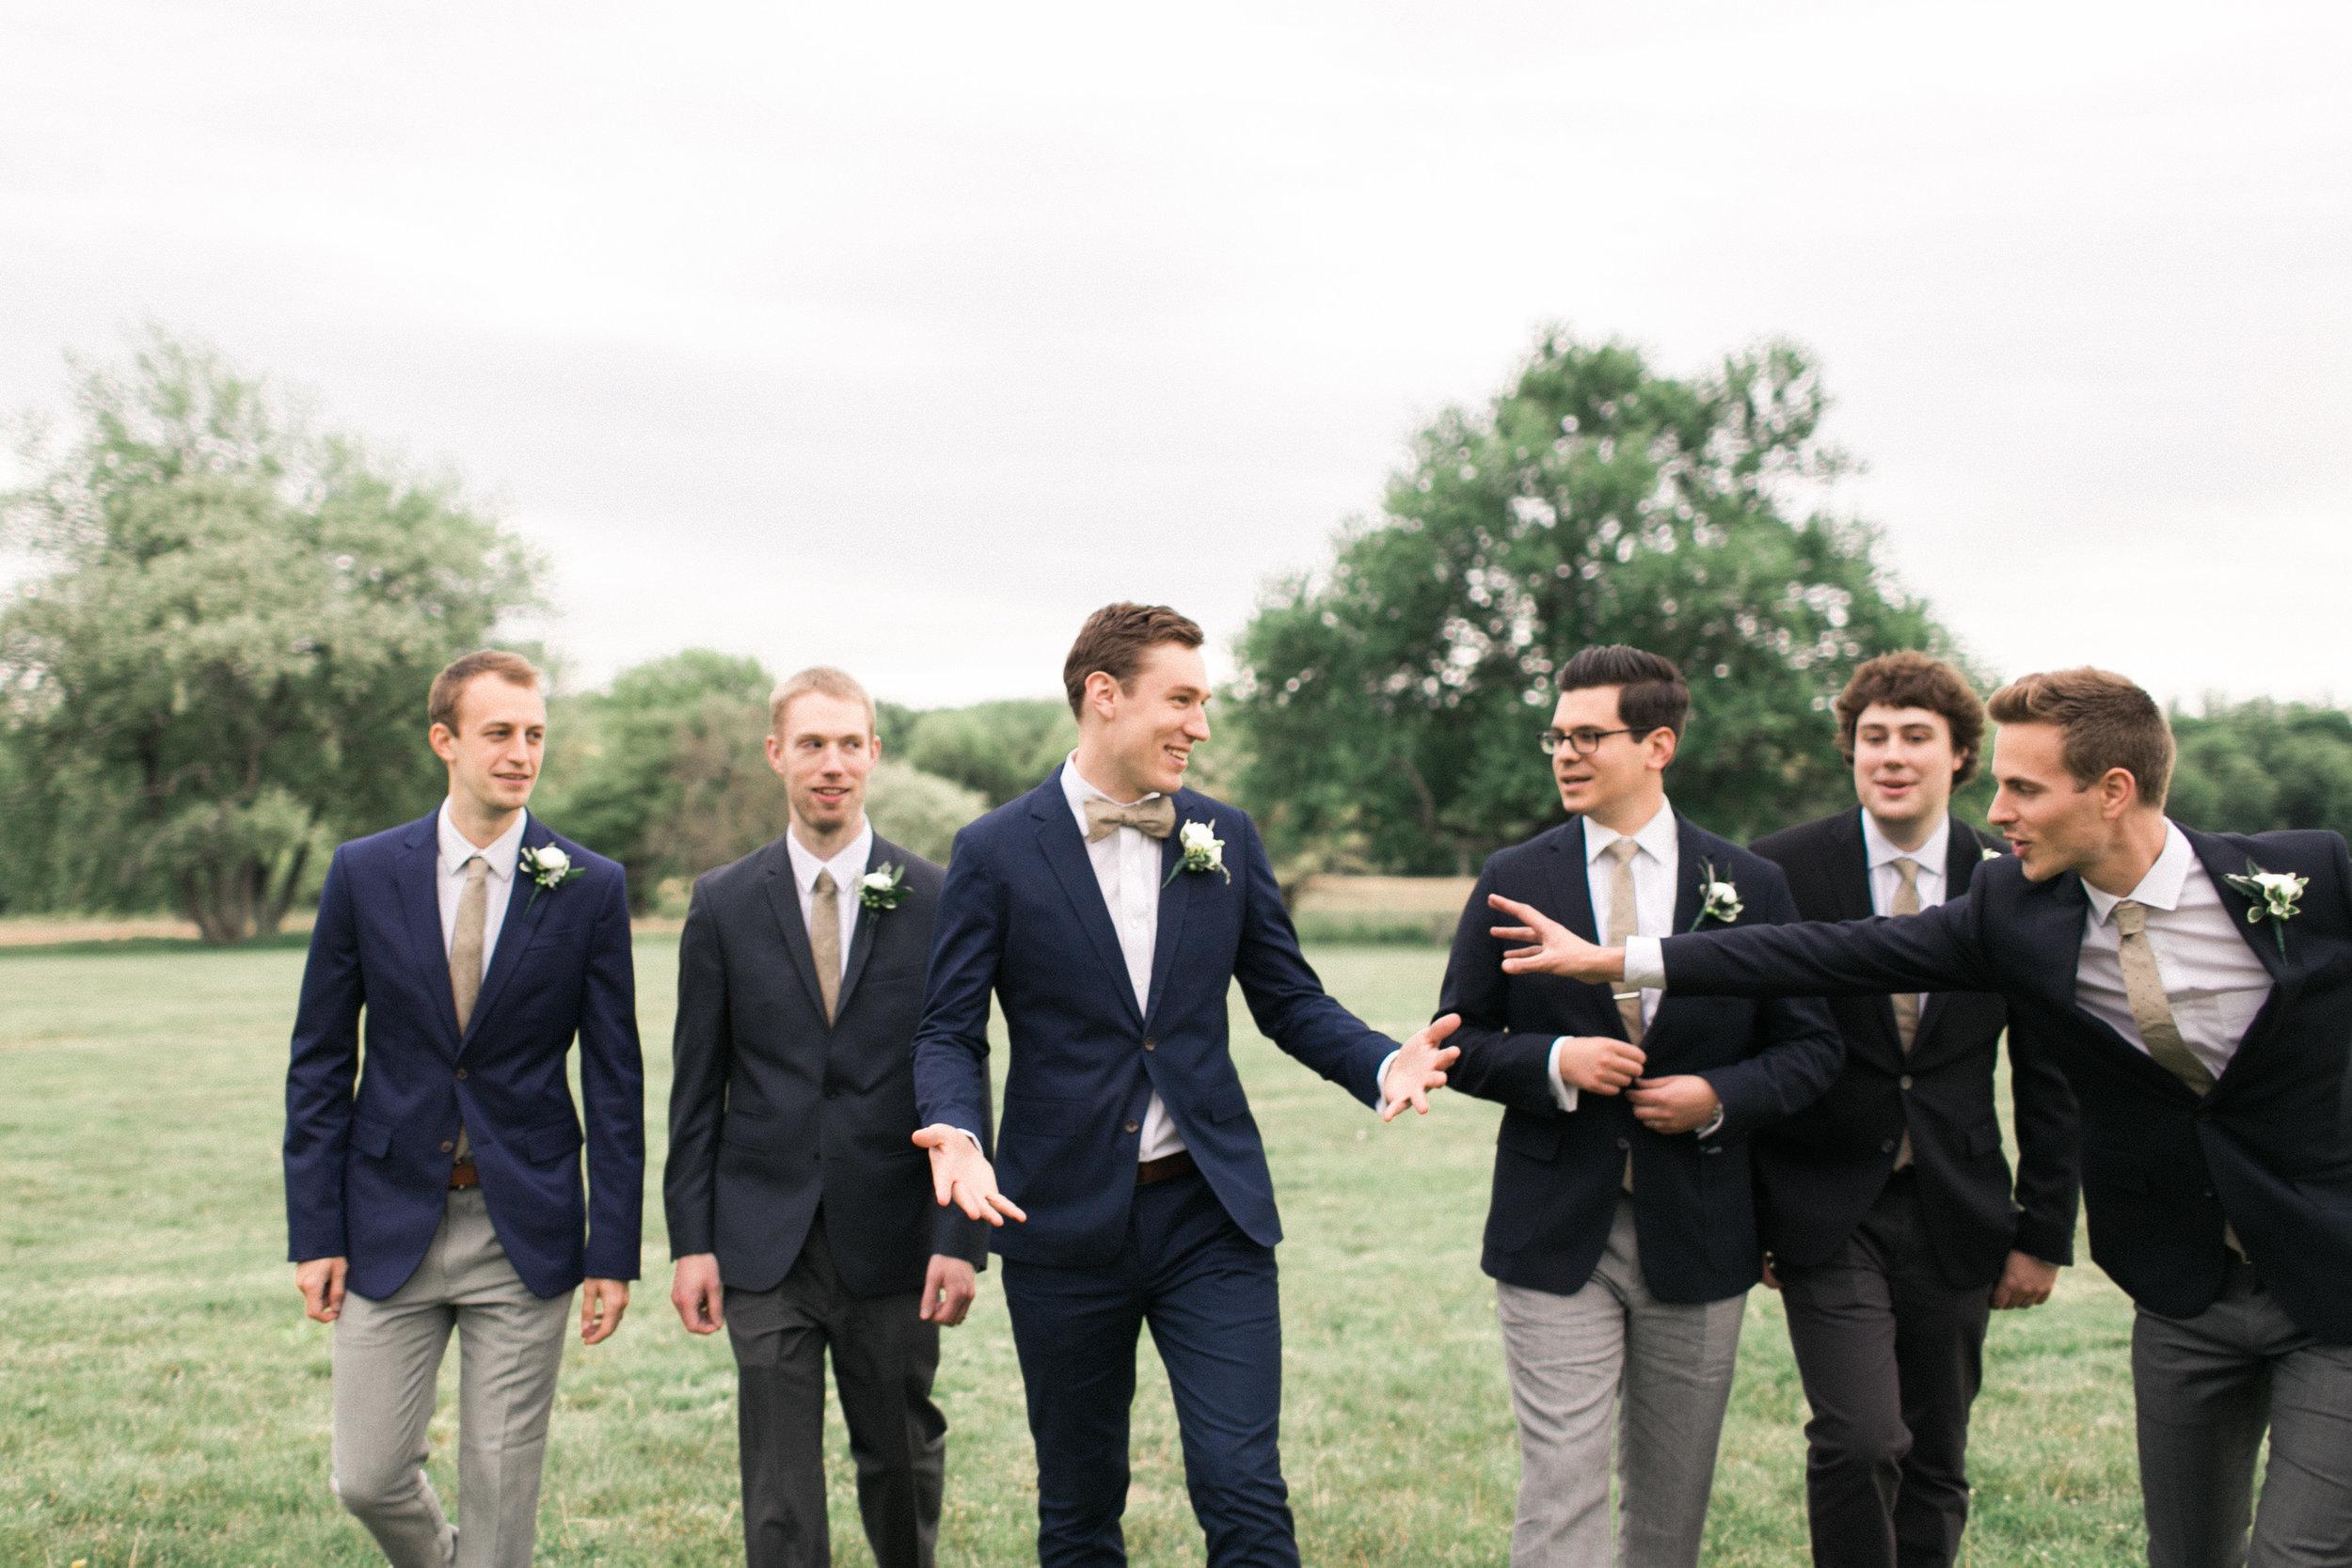 mayden photography weddings-48.jpg